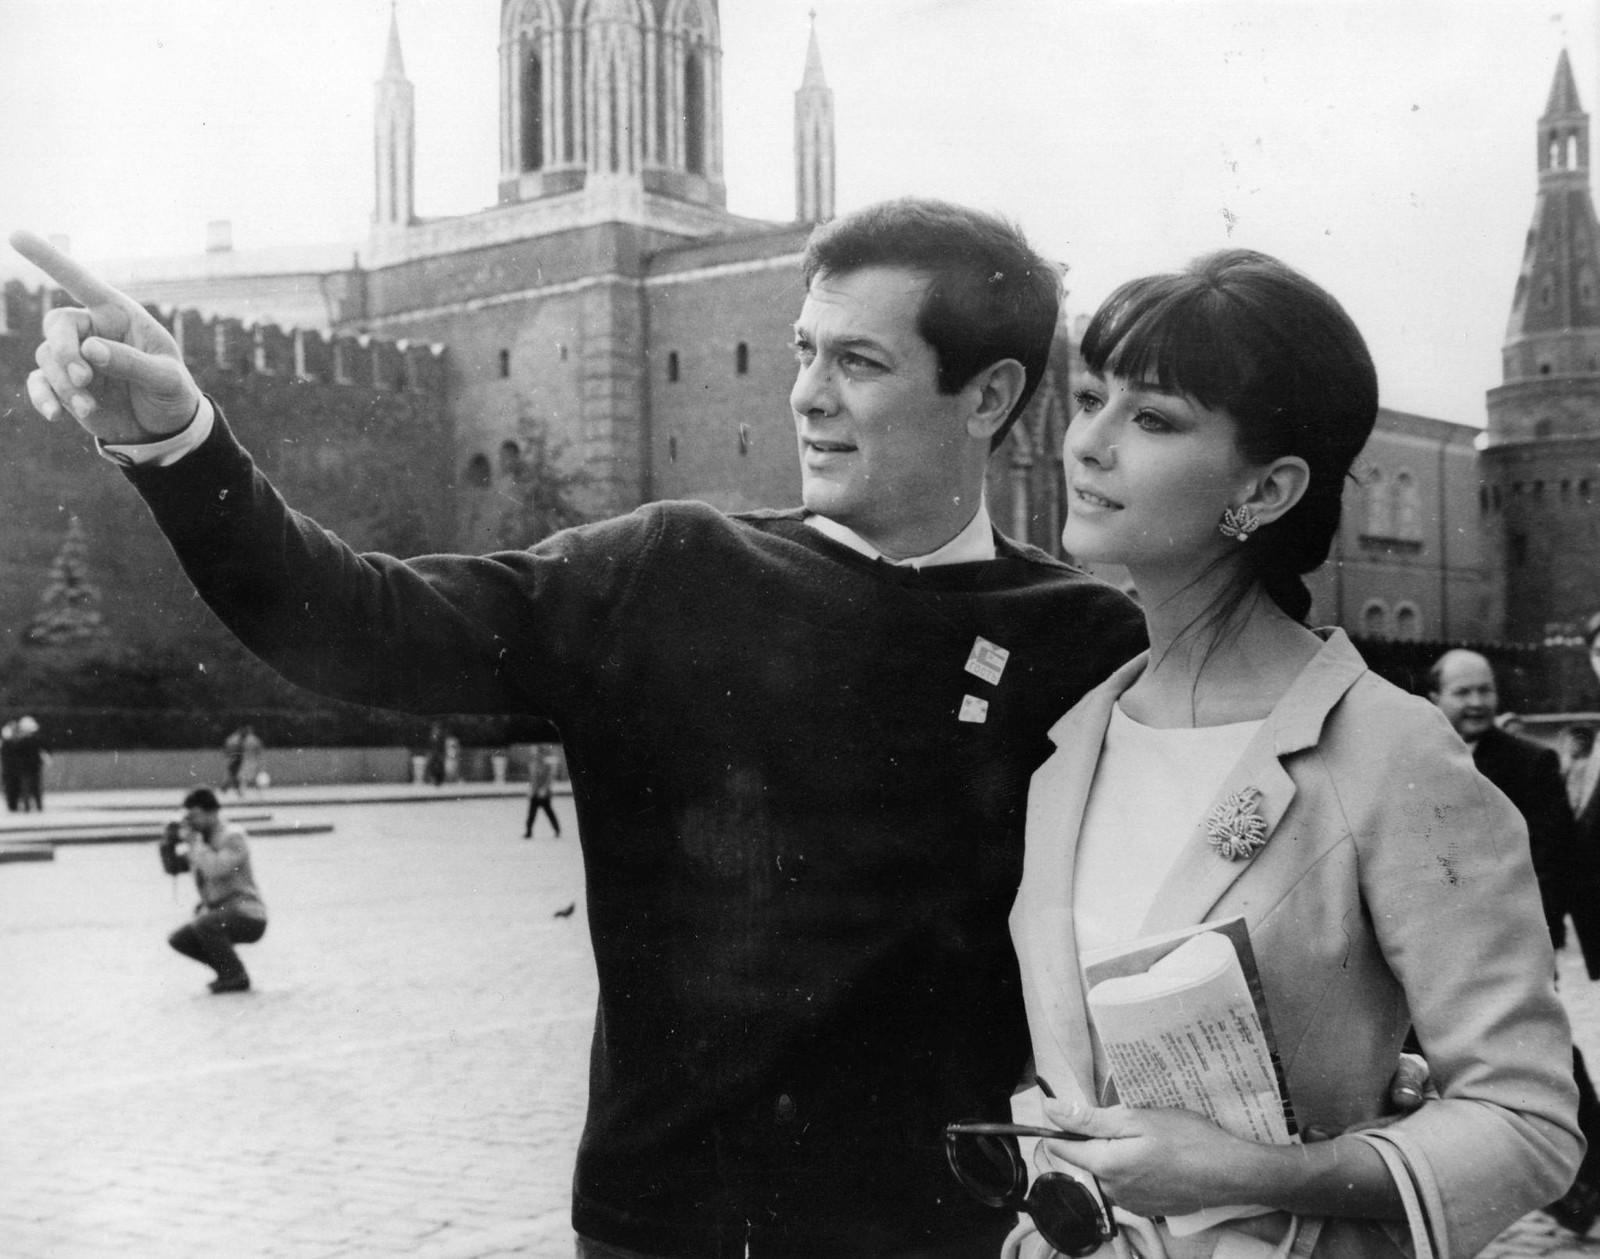 04. Тони Кертис и Кристин Кауфманн на Красной площади